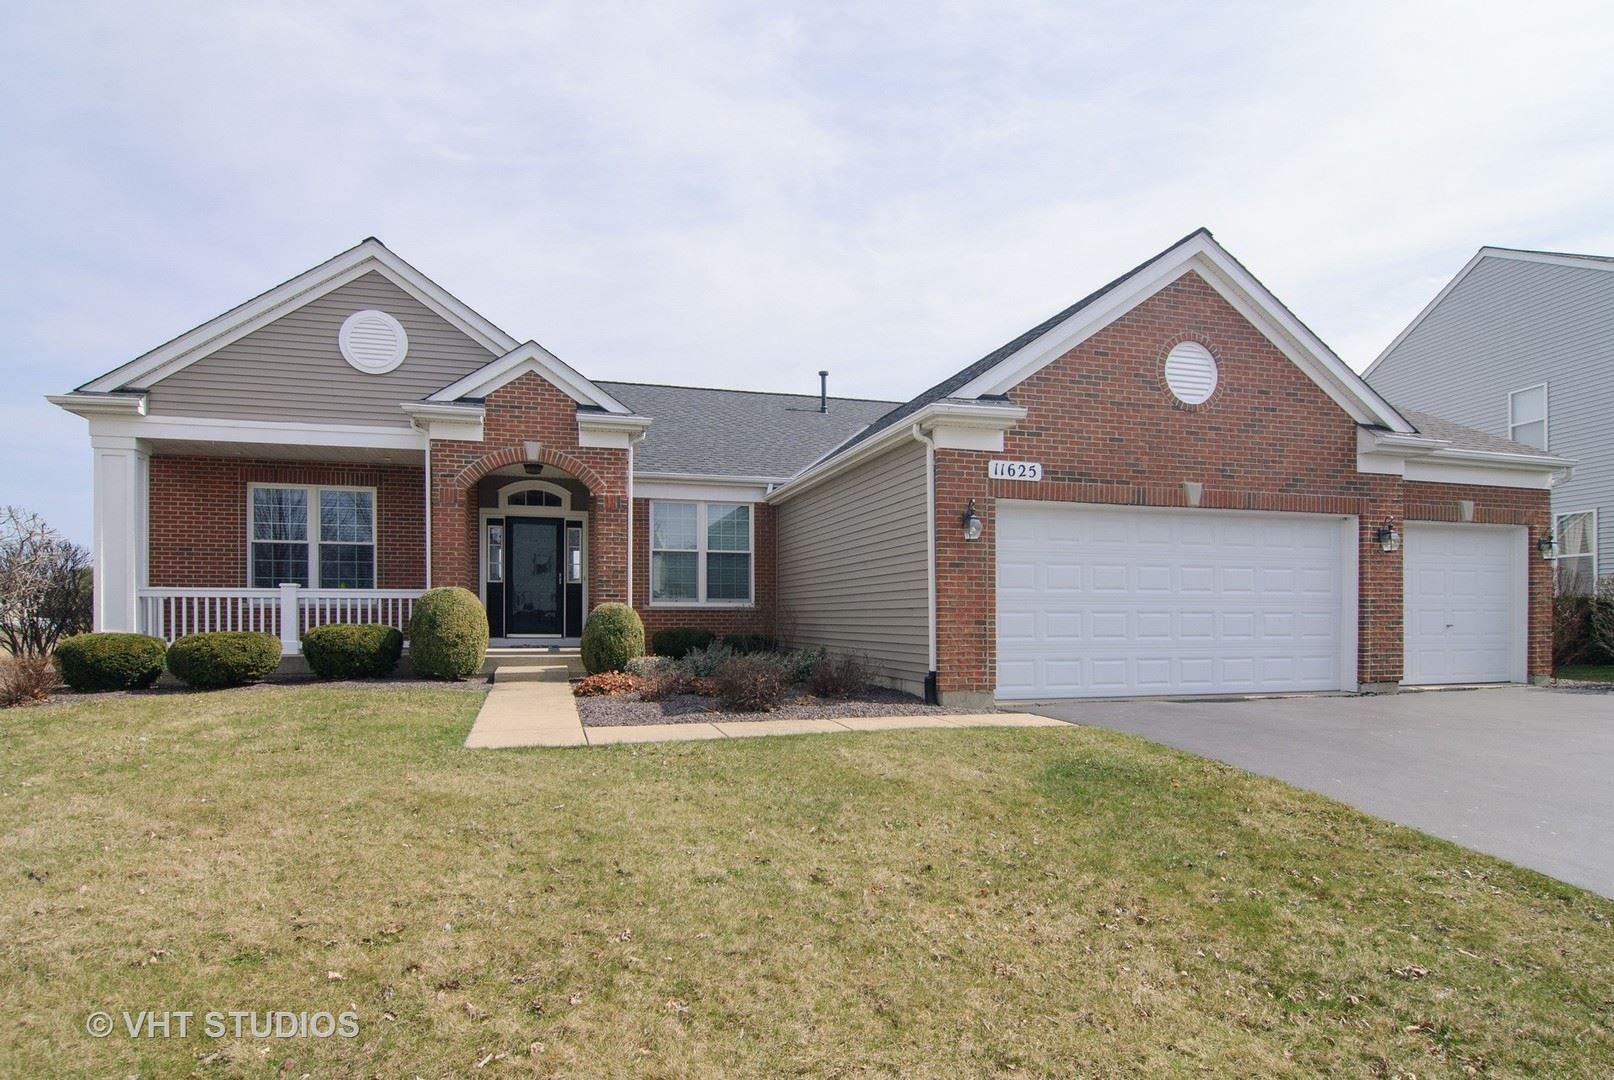 11625 Heritage Meadows Drive, Plainfield, IL 60585 - #: 10666507